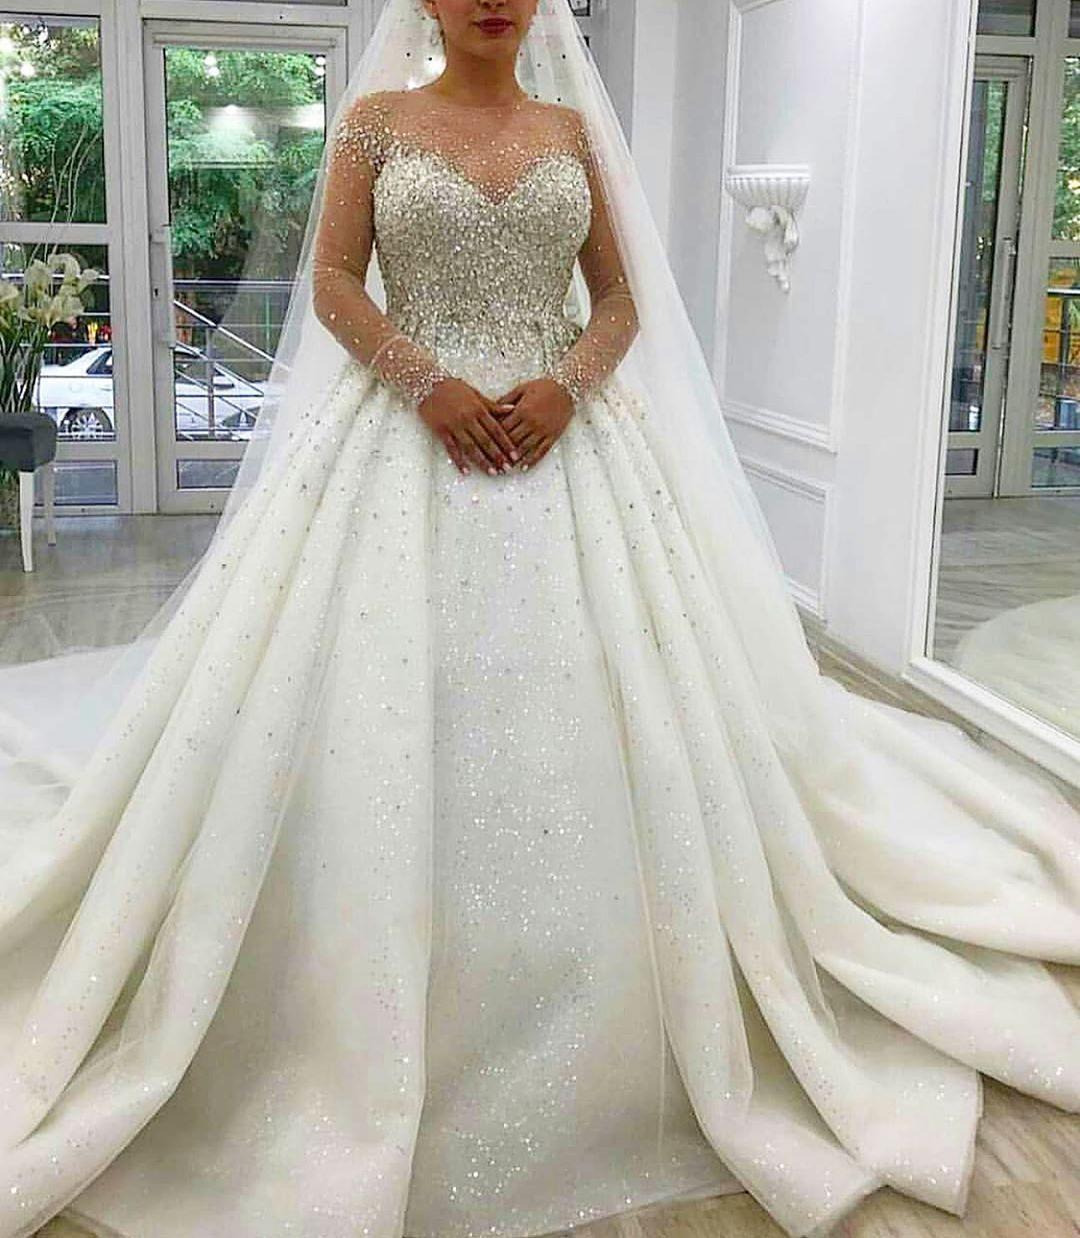 Fall Winter Muslim Long Sleeve Cinderella Wedding Dress Princess Bridal Gowns Long Train Wedding Dress Princess Wedding Dresses Cinderella Ball Gowns Wedding [ 1000 x 1000 Pixel ]